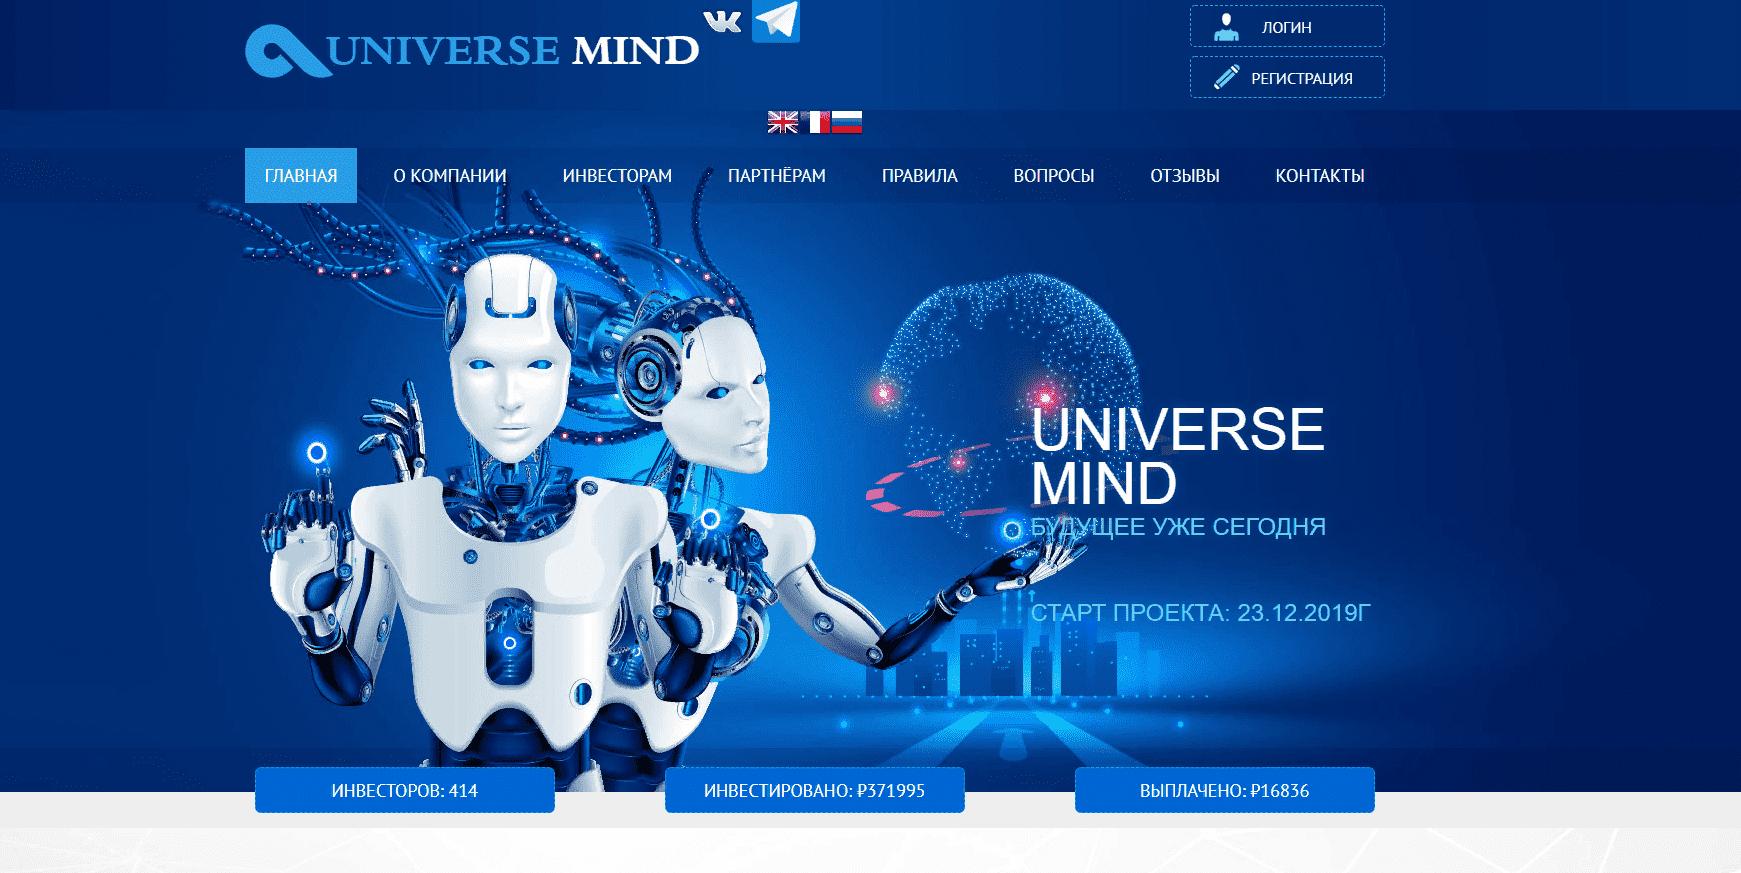 UNIVERSE MIND